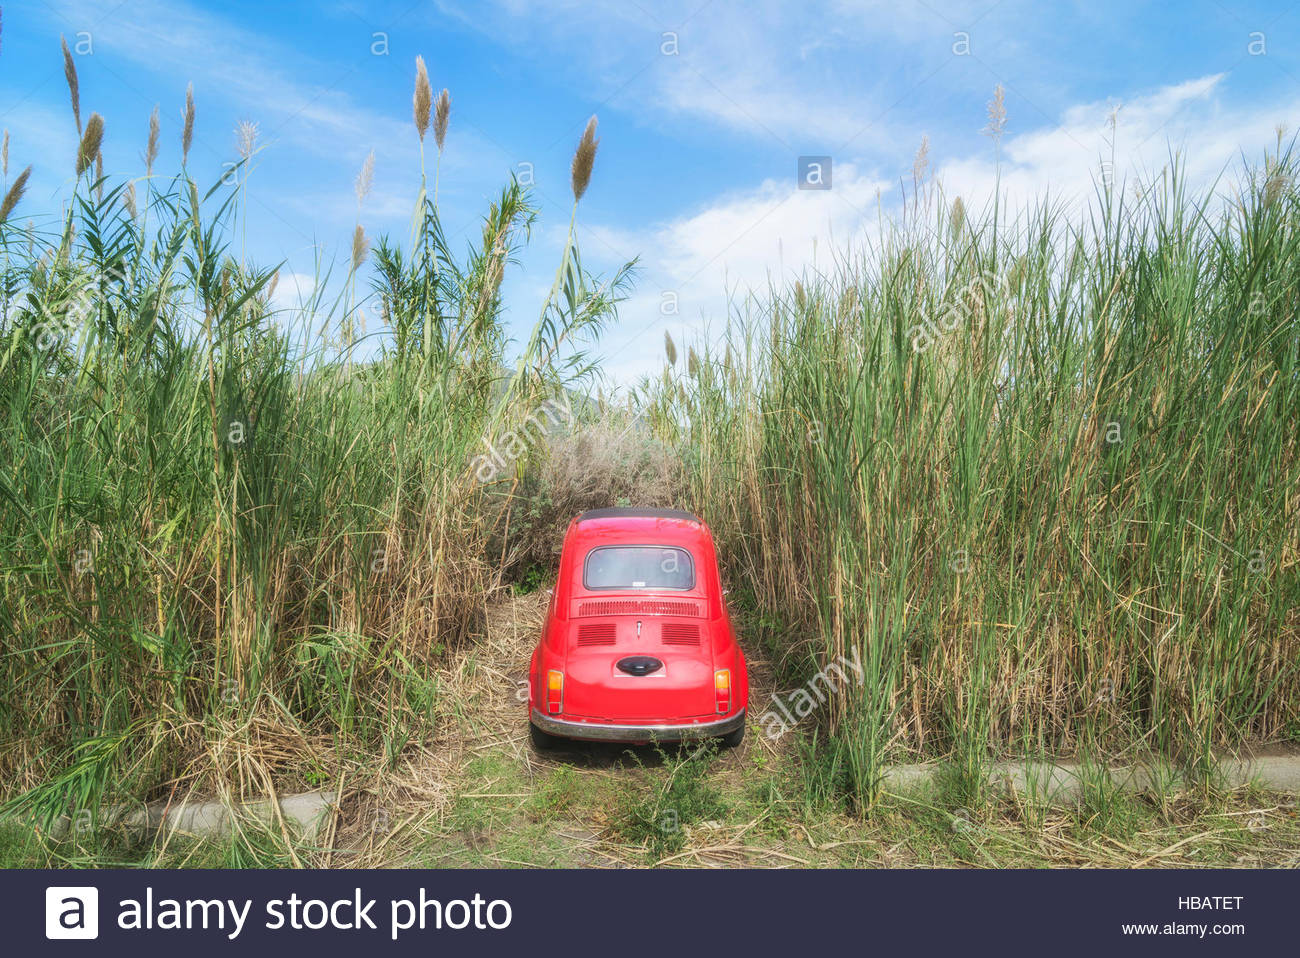 Coche aparcado entre Pasto largo, Lipari, las Islas Eolias, en Sicilia, Italia Imagen De Stock